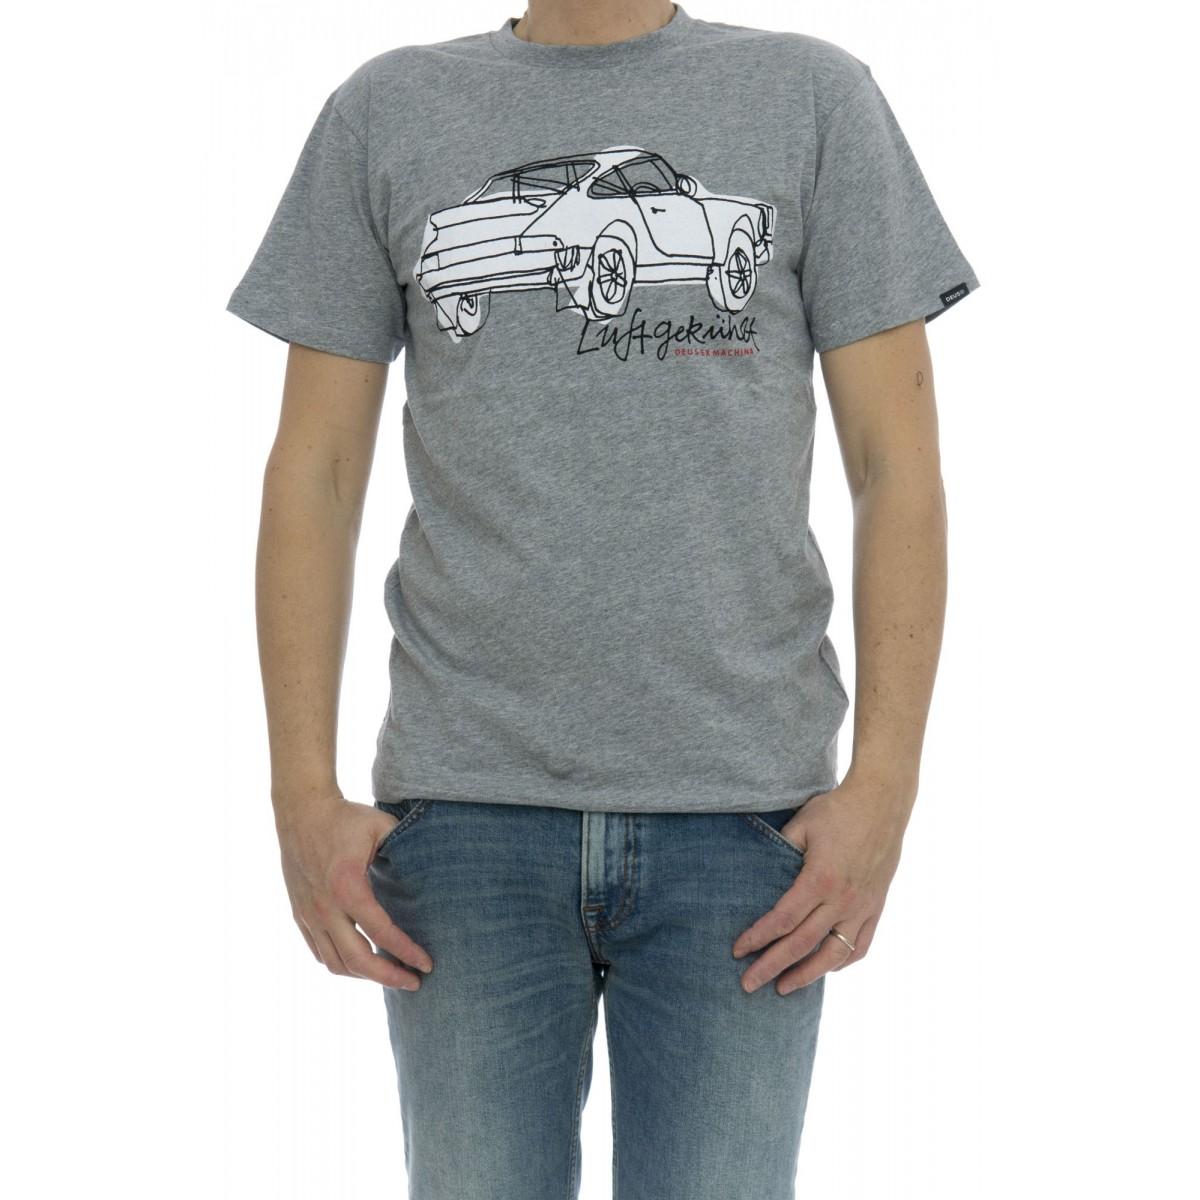 T-shirt - Dmp71504